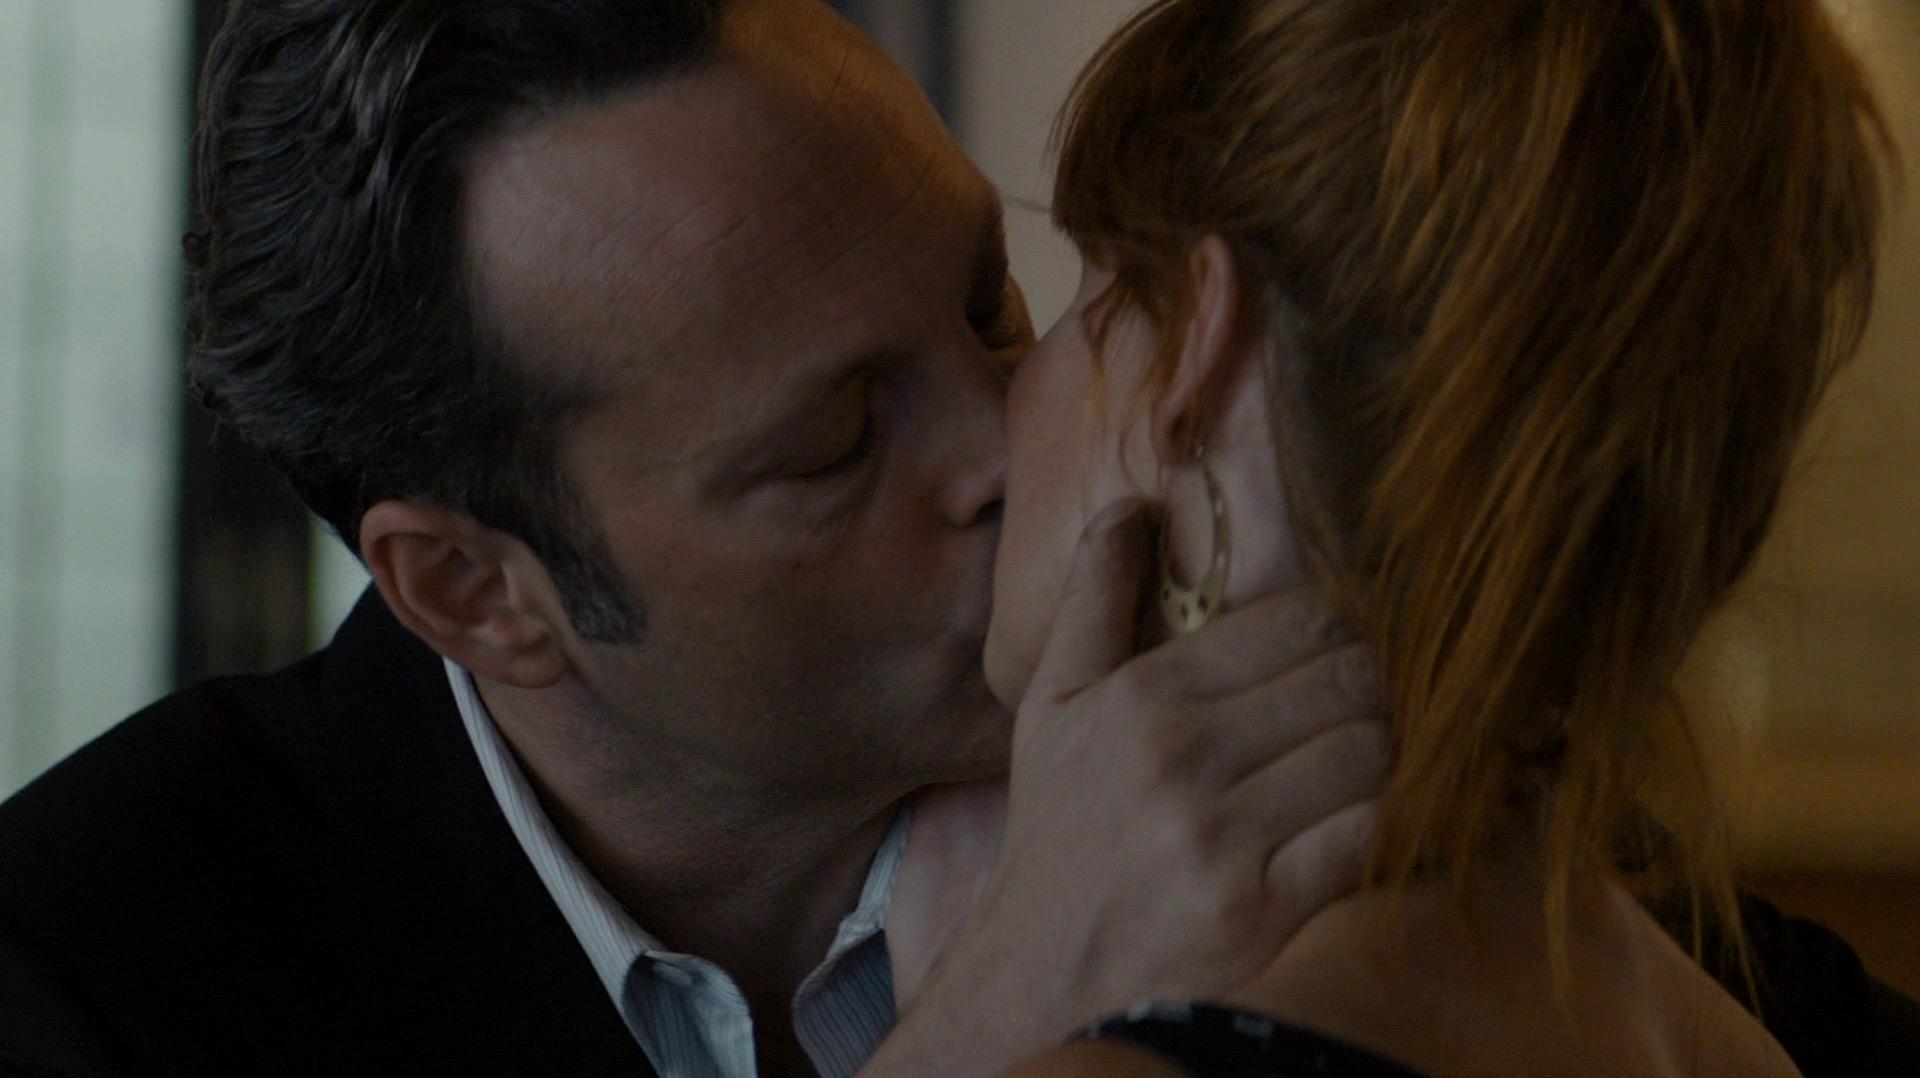 Jordan and Frank kiss goodbye